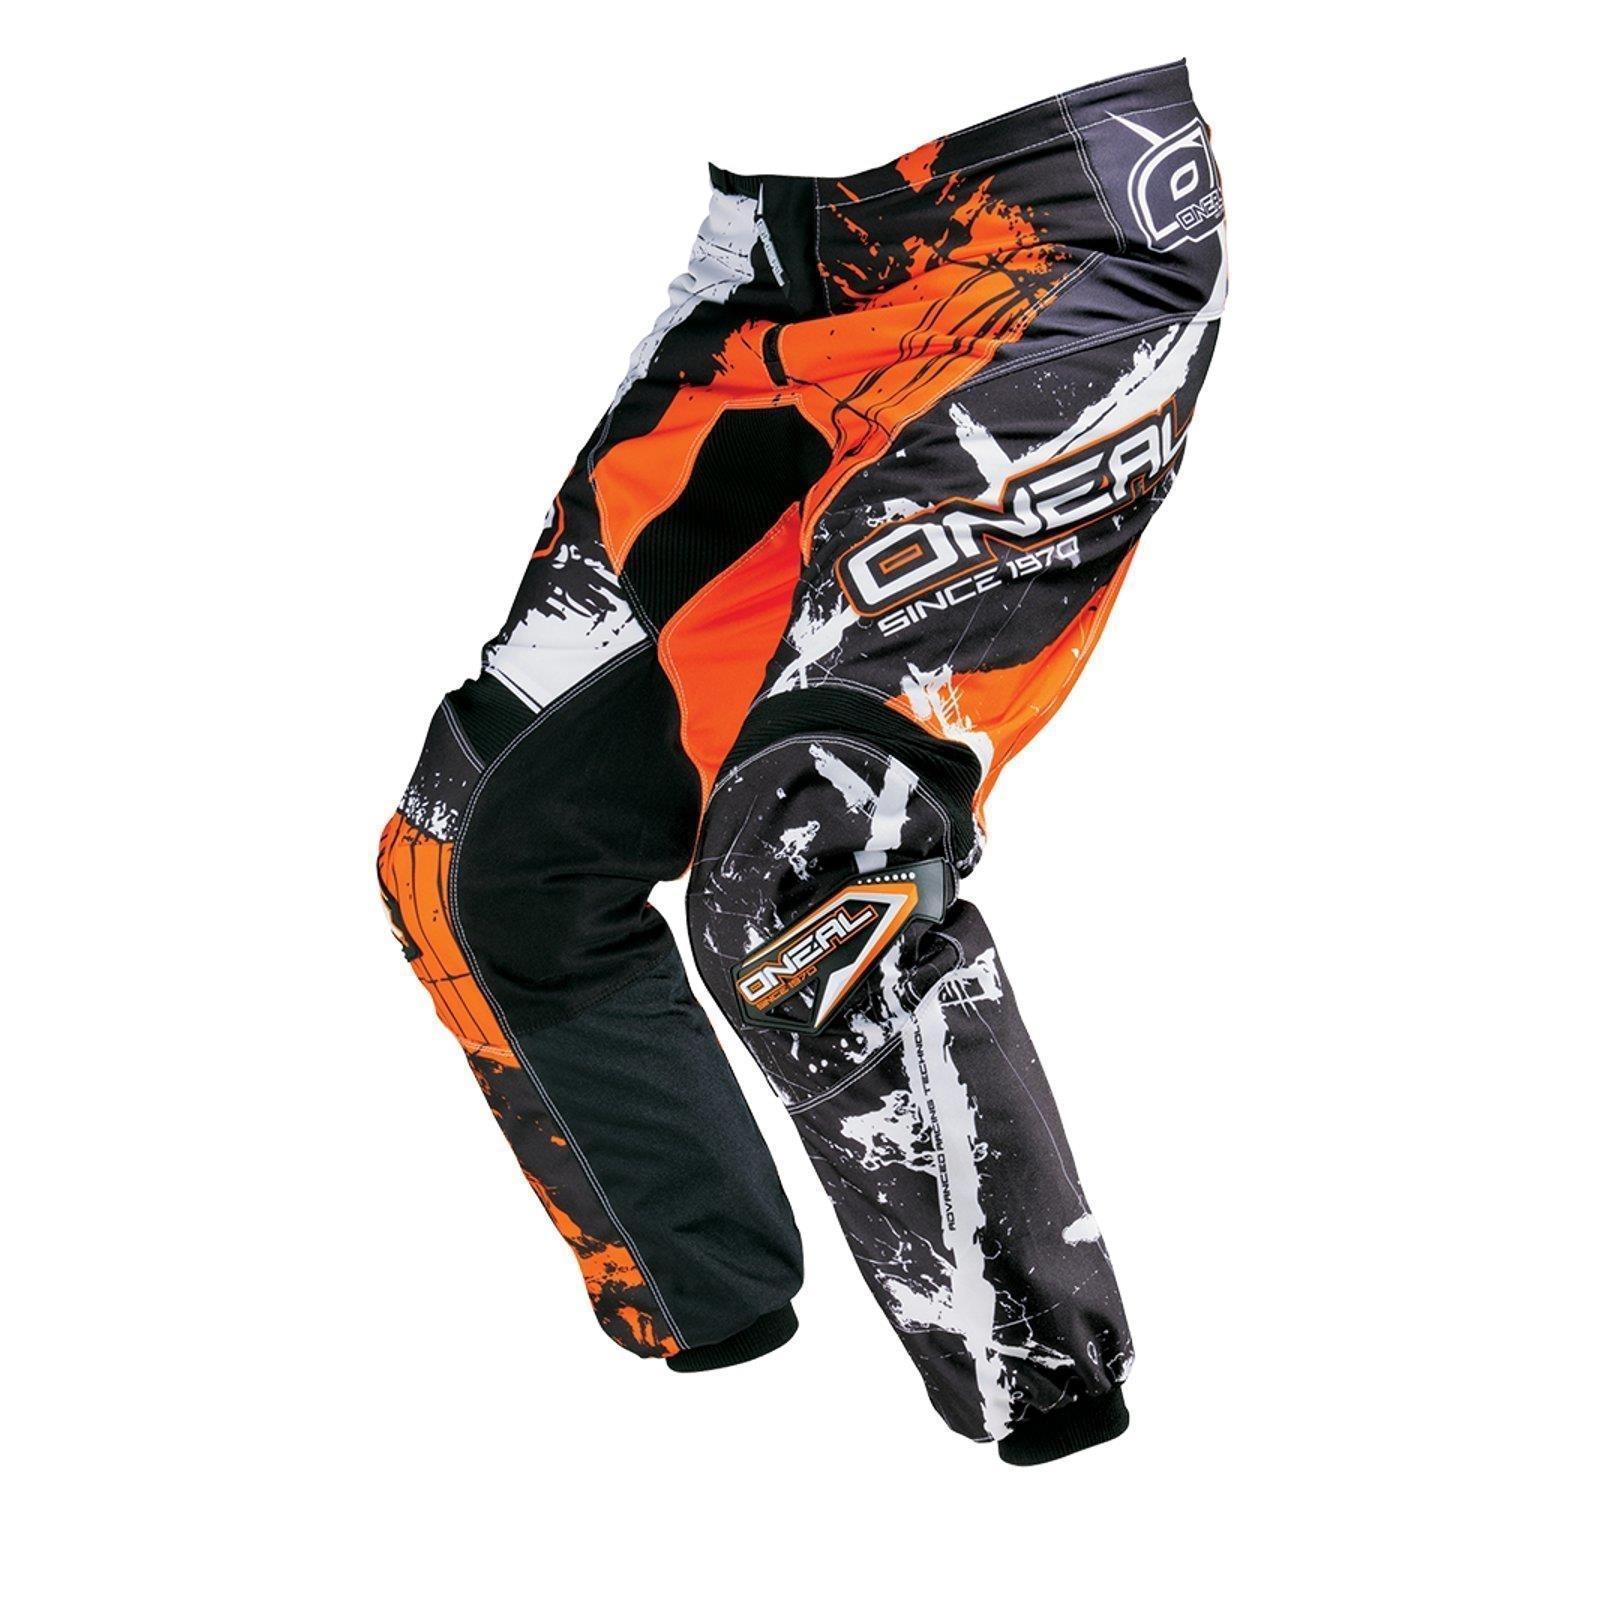 Oneal-elemento-ninos-MX-Jersey-pantalones-Shocker-Moto-Cross-Enduro-Mountainbike-MTB miniatura 17